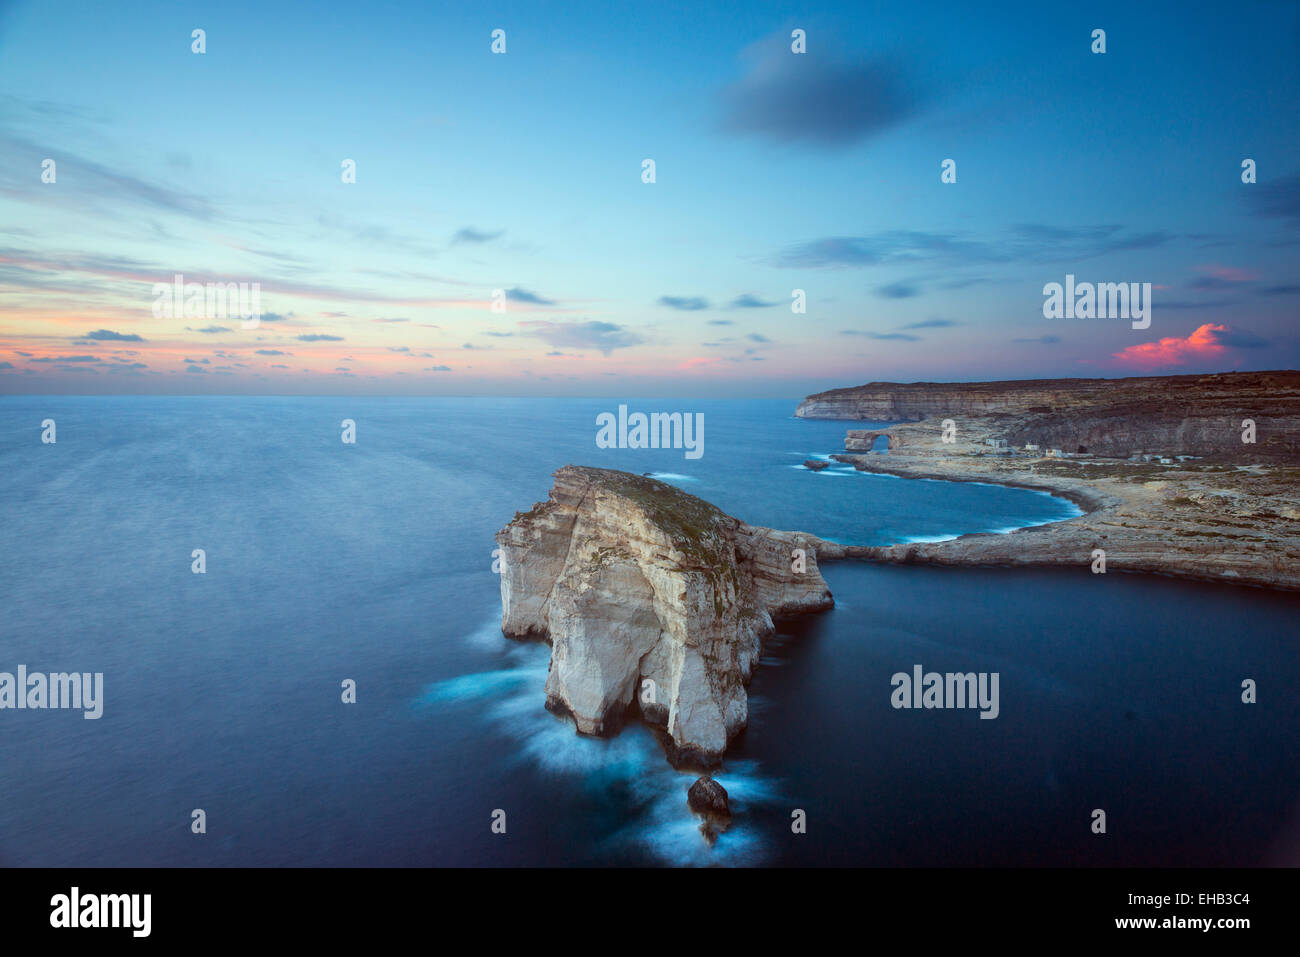 Mittelmeer Europa, Malta, Insel Gozo, Dwerja Bay, Fungus Rock und The Azure Window naturale Stockfoto